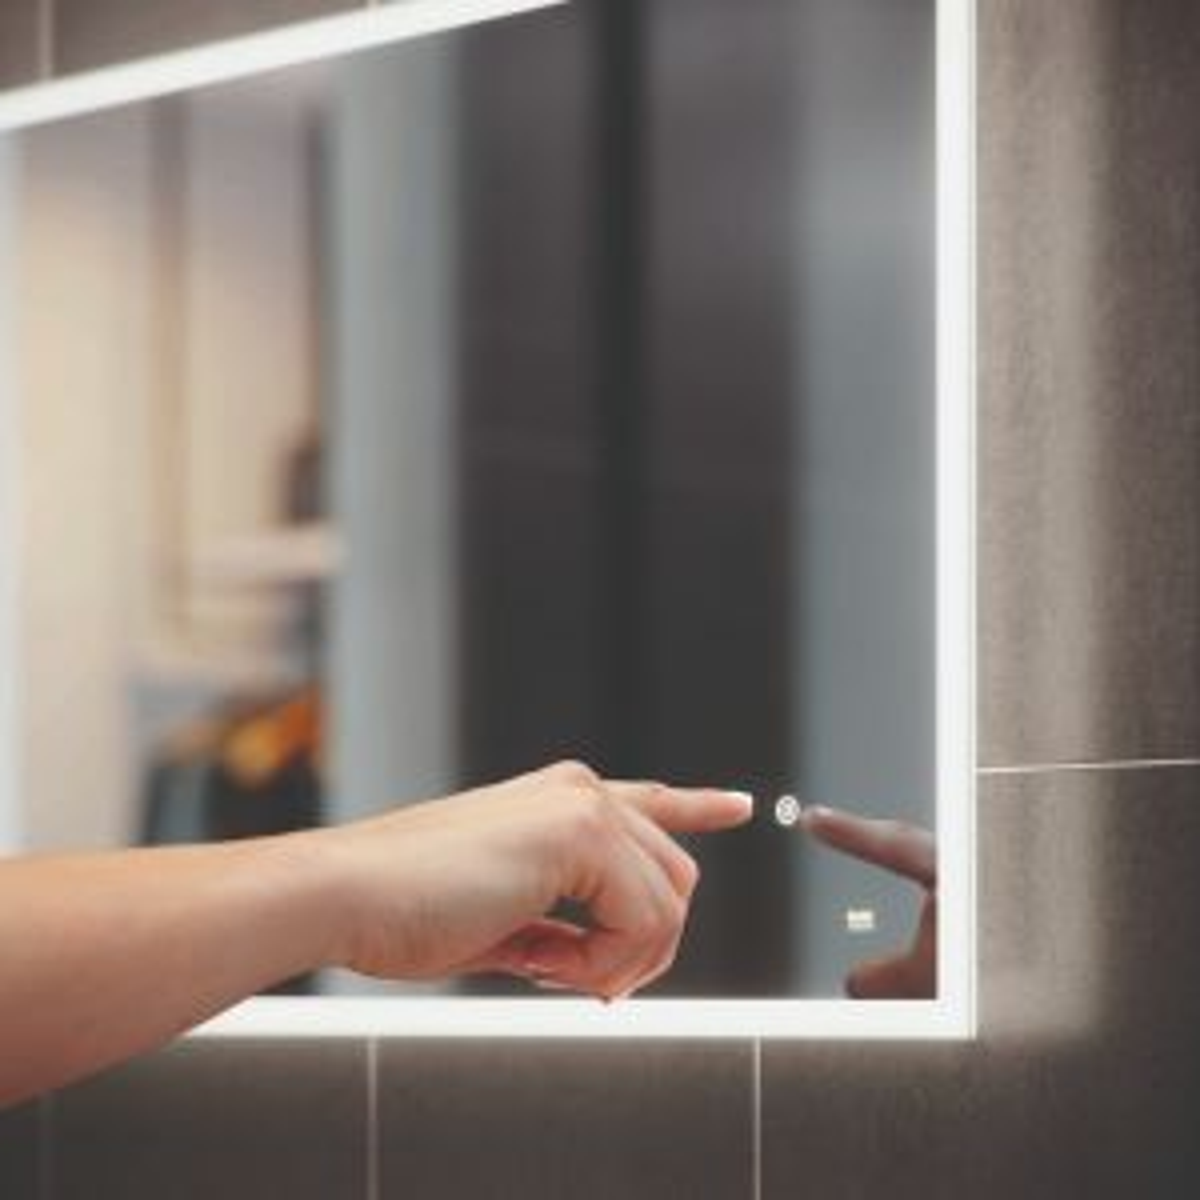 RAK Demeter Round Magnifying Mirror With Light Lifestyle